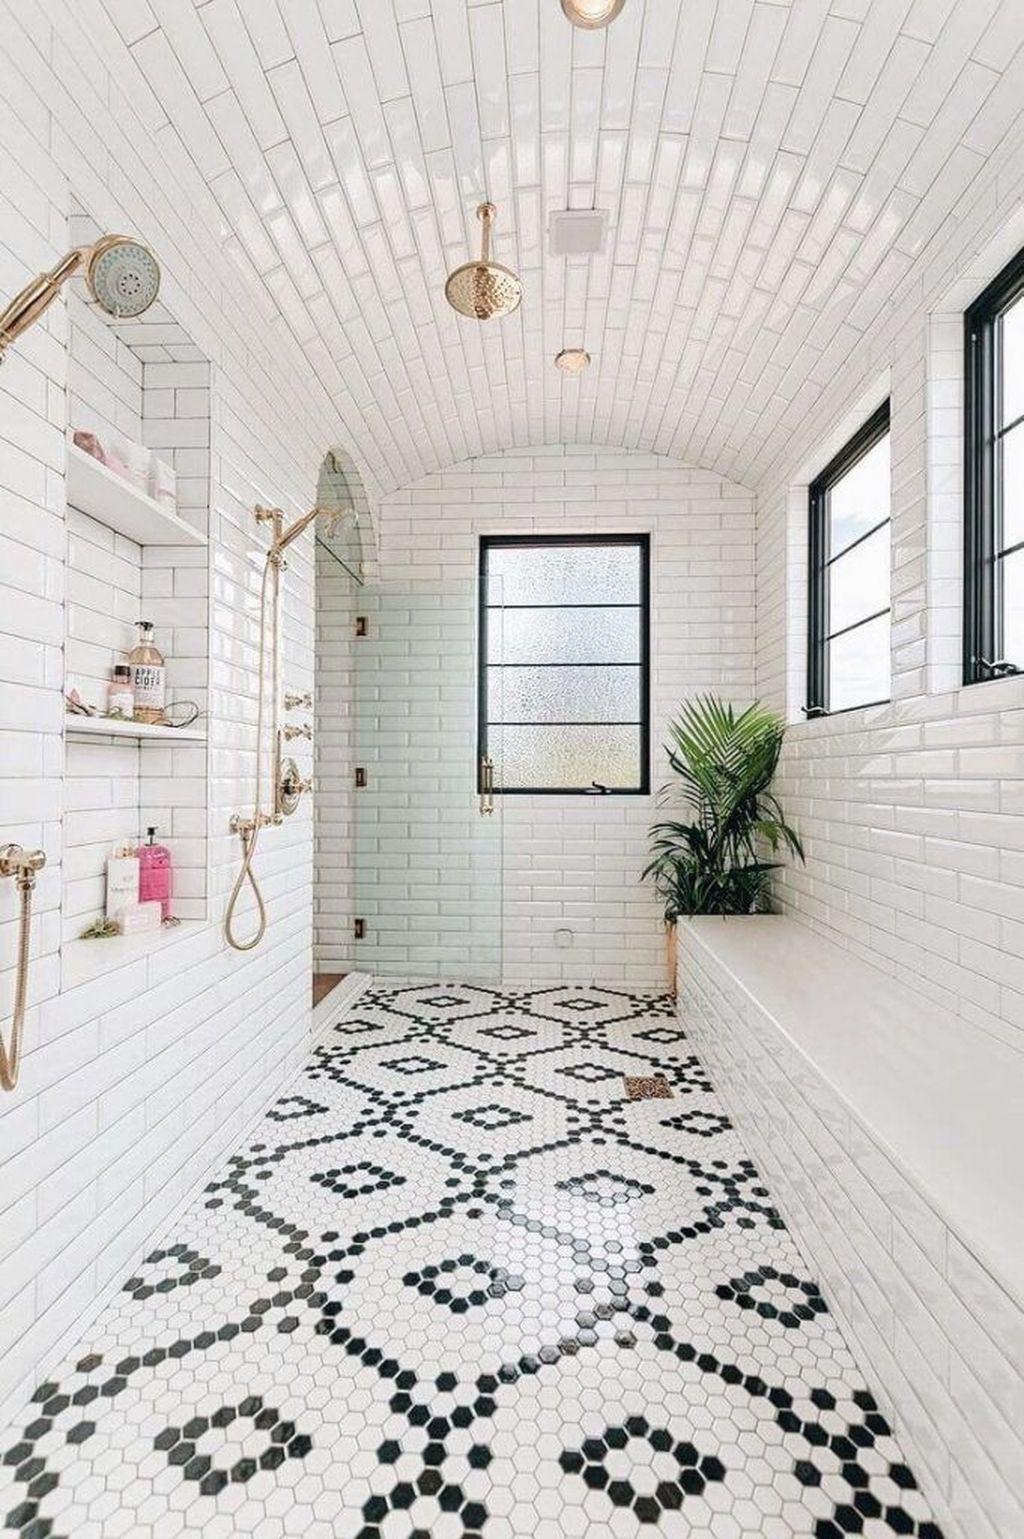 Inspiring Bathroom Tile Ideas 09